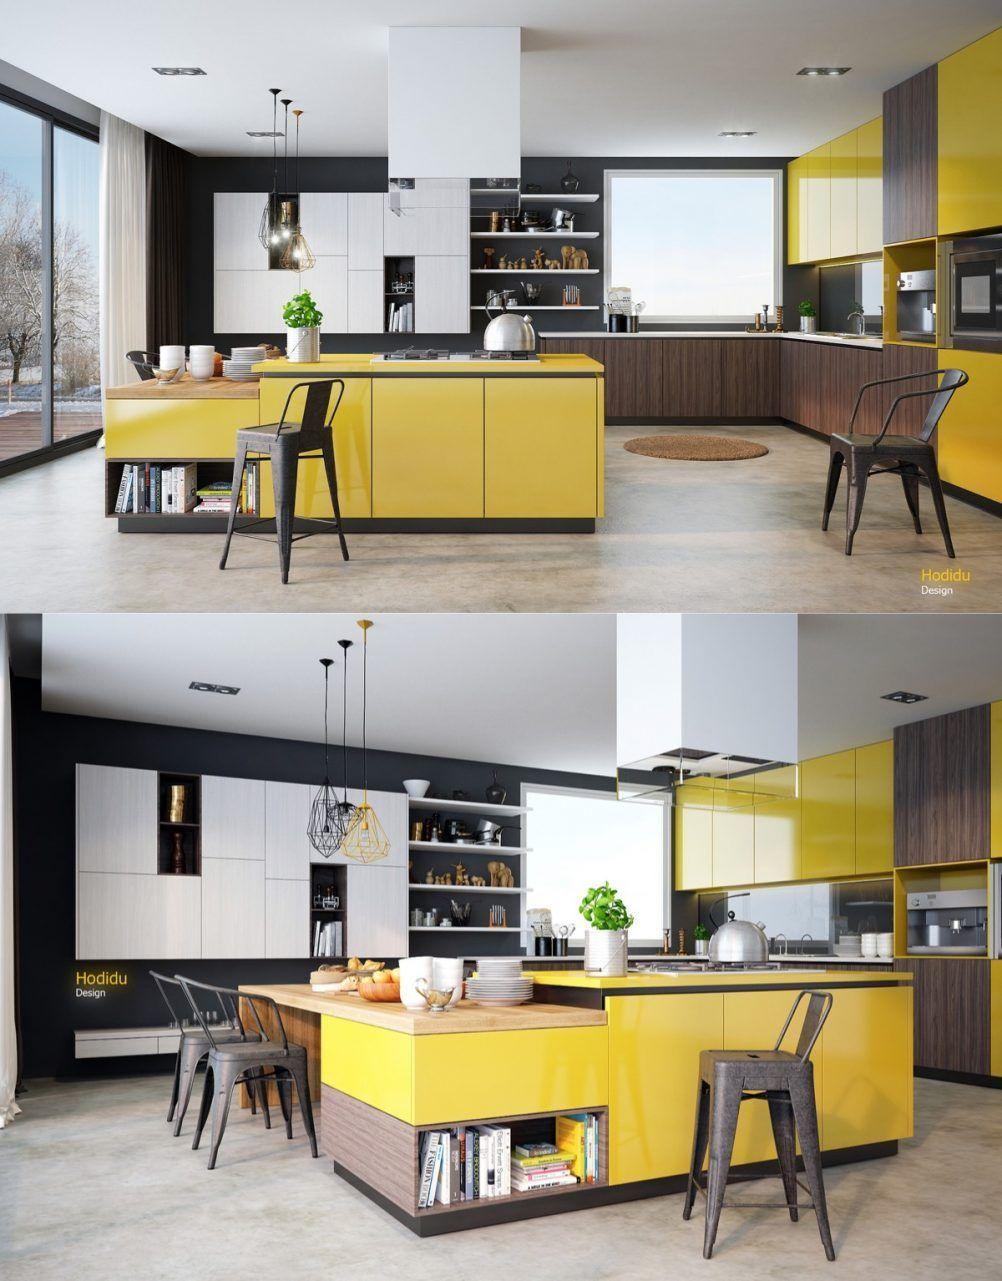 Stylish Modern Kitchen Decor Blue And Yellow Decorating Ideas